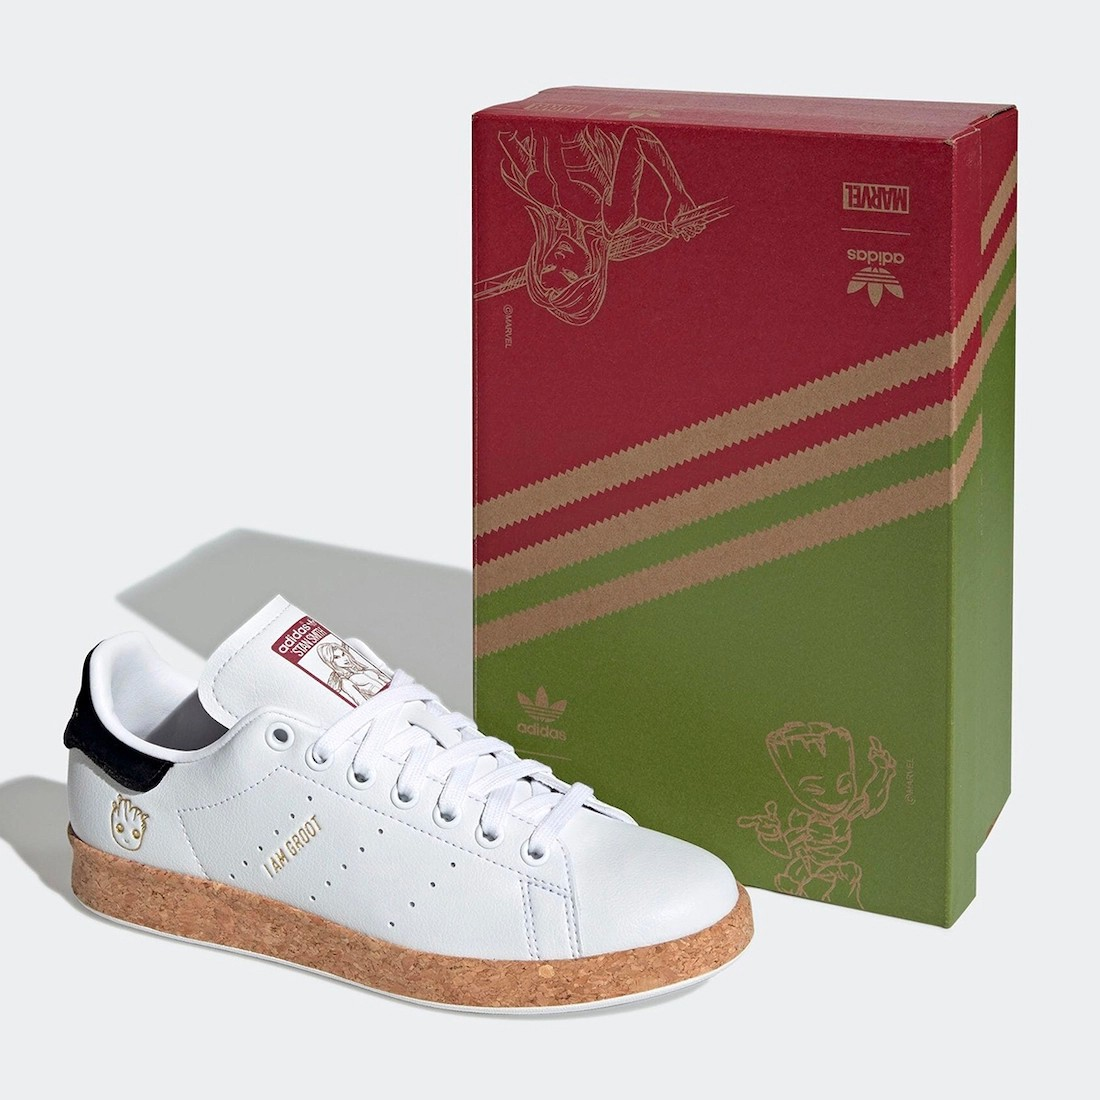 adidas Originals,Marvel,groot,  幼年「格鲁特」可太萌了!漫威 adidas 新联名即将发售!